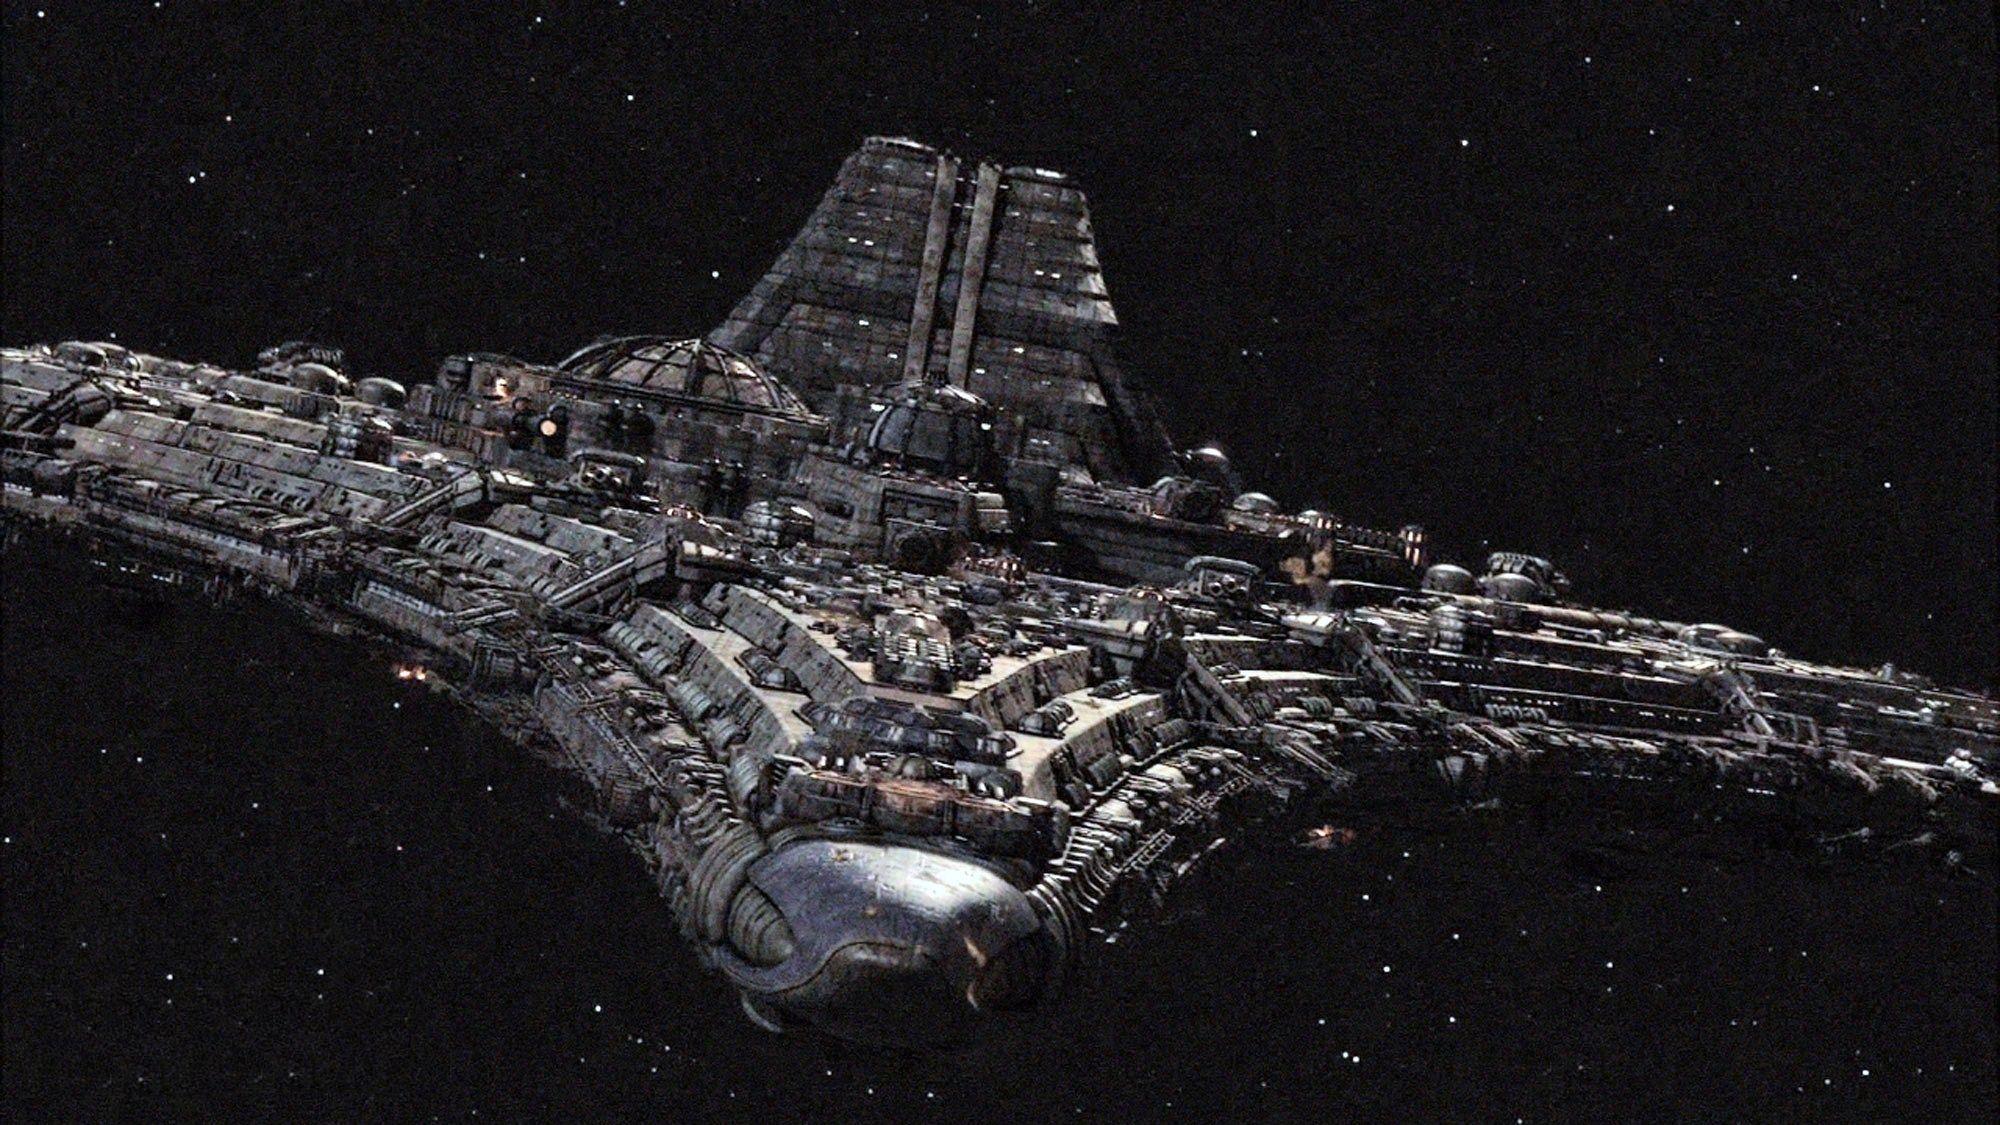 stargate wallpaper universe space - photo #14